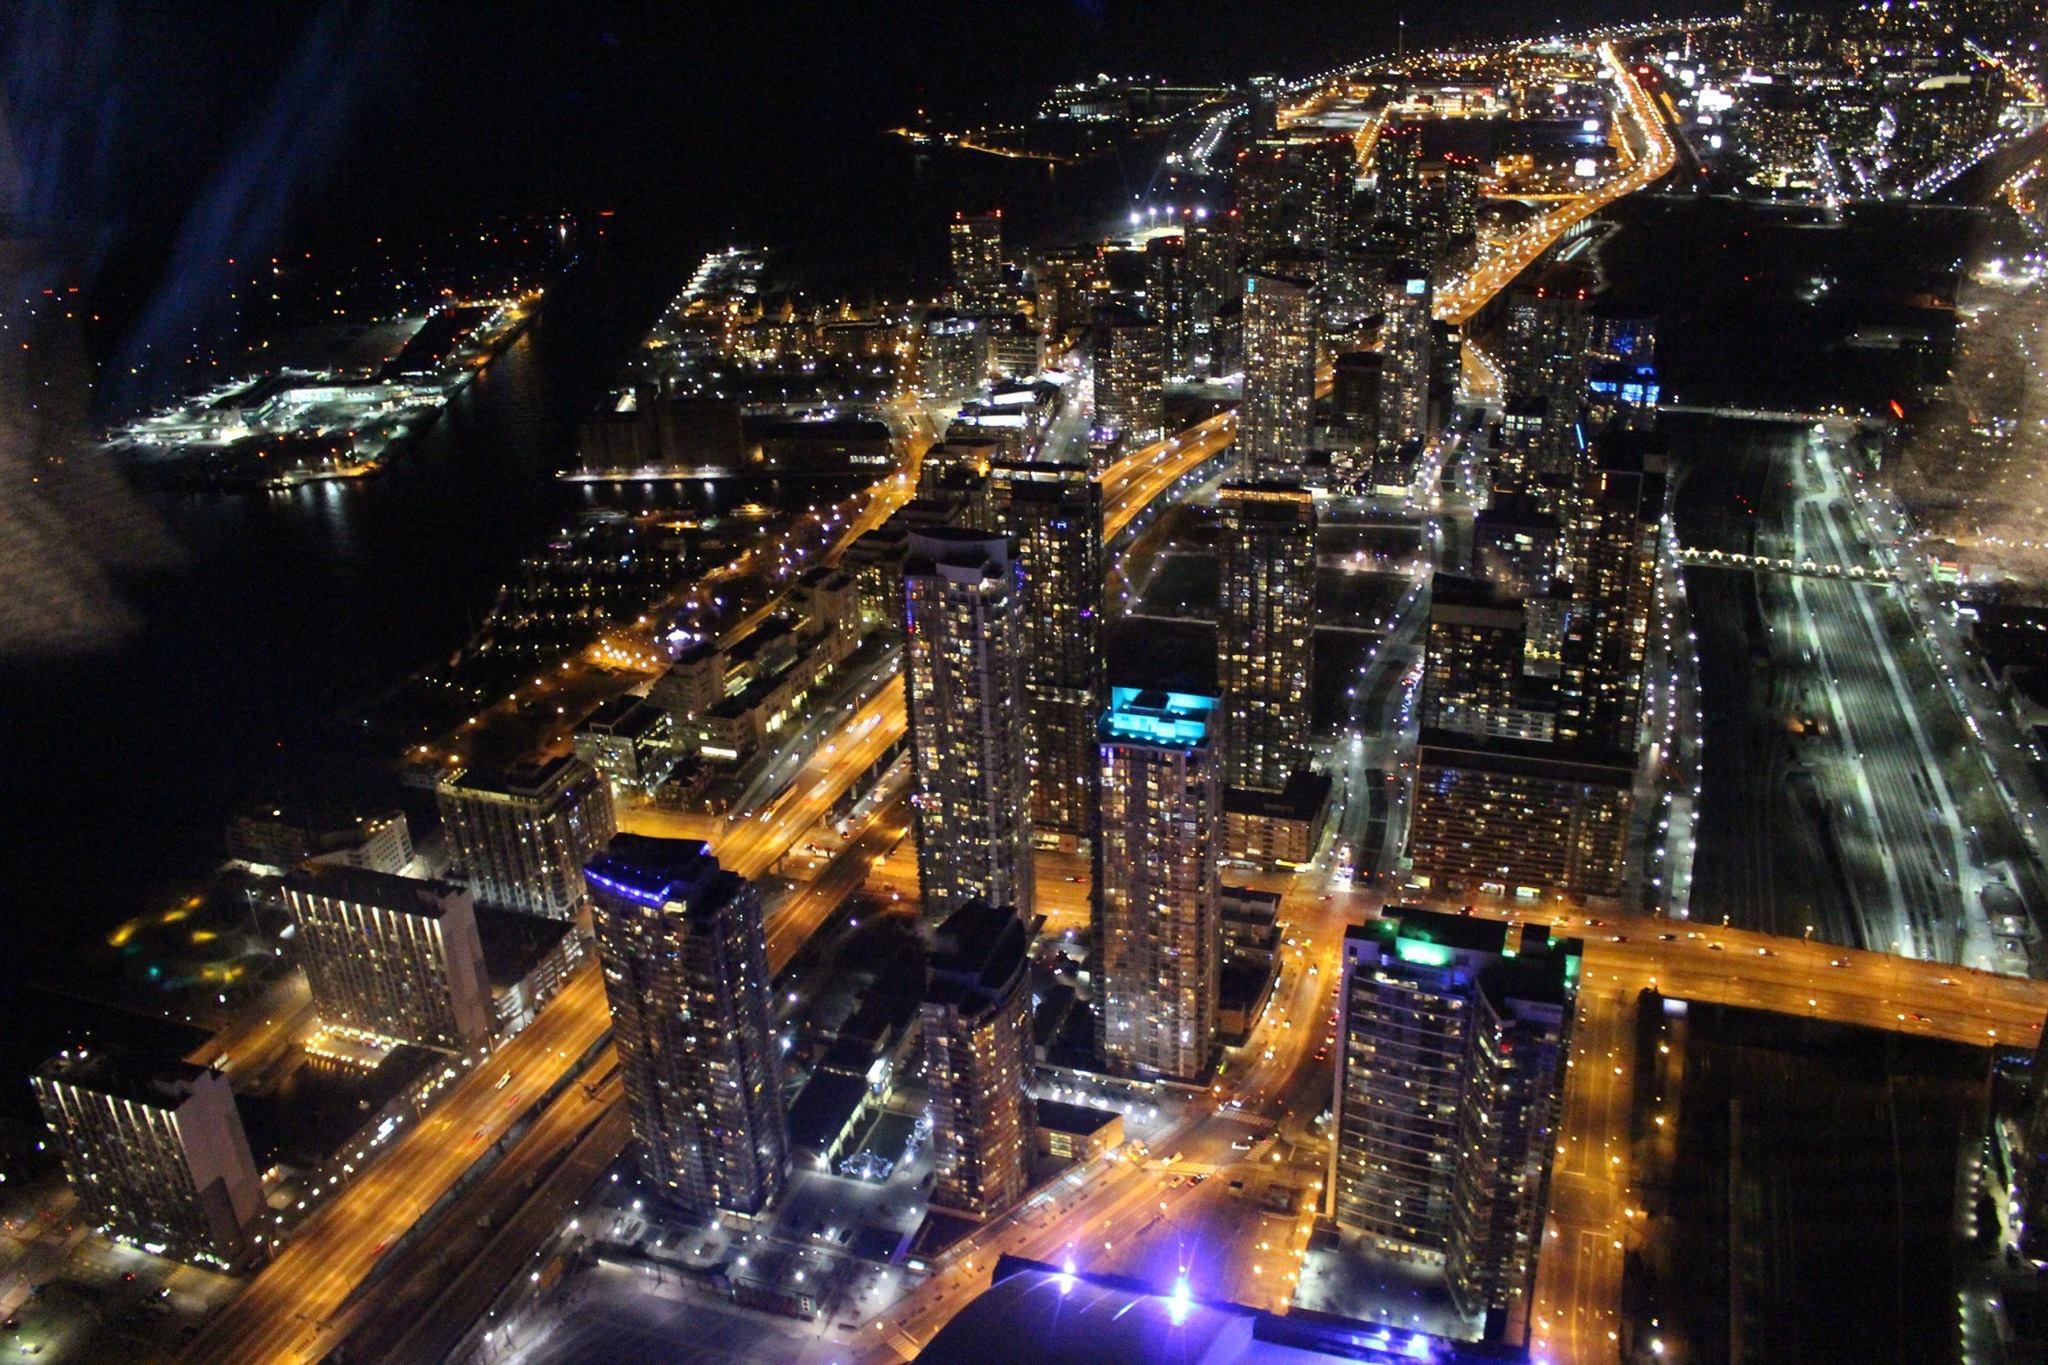 Toronto: The CN Tower